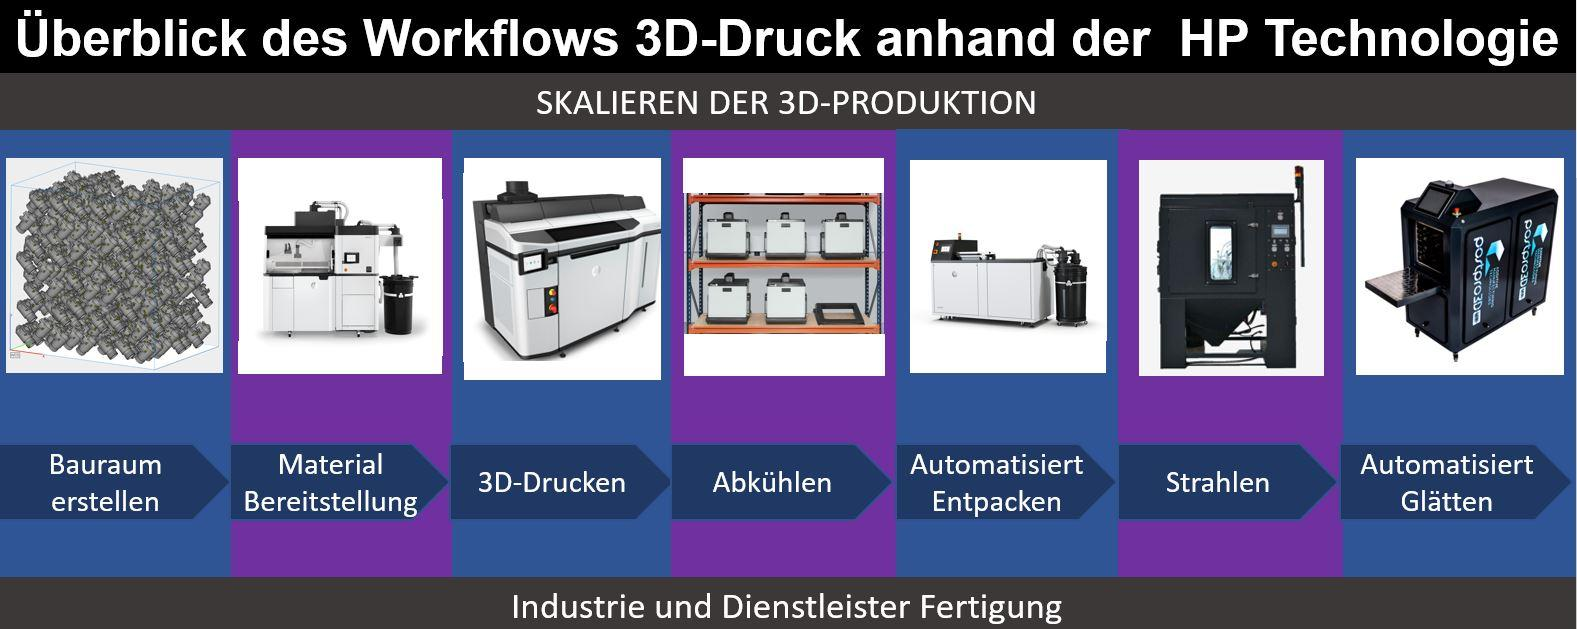 3D-Druck-Workflow Unpacking-Station HP-Jet-Fusion-5200 Entpacken Bauräume-Entpacken